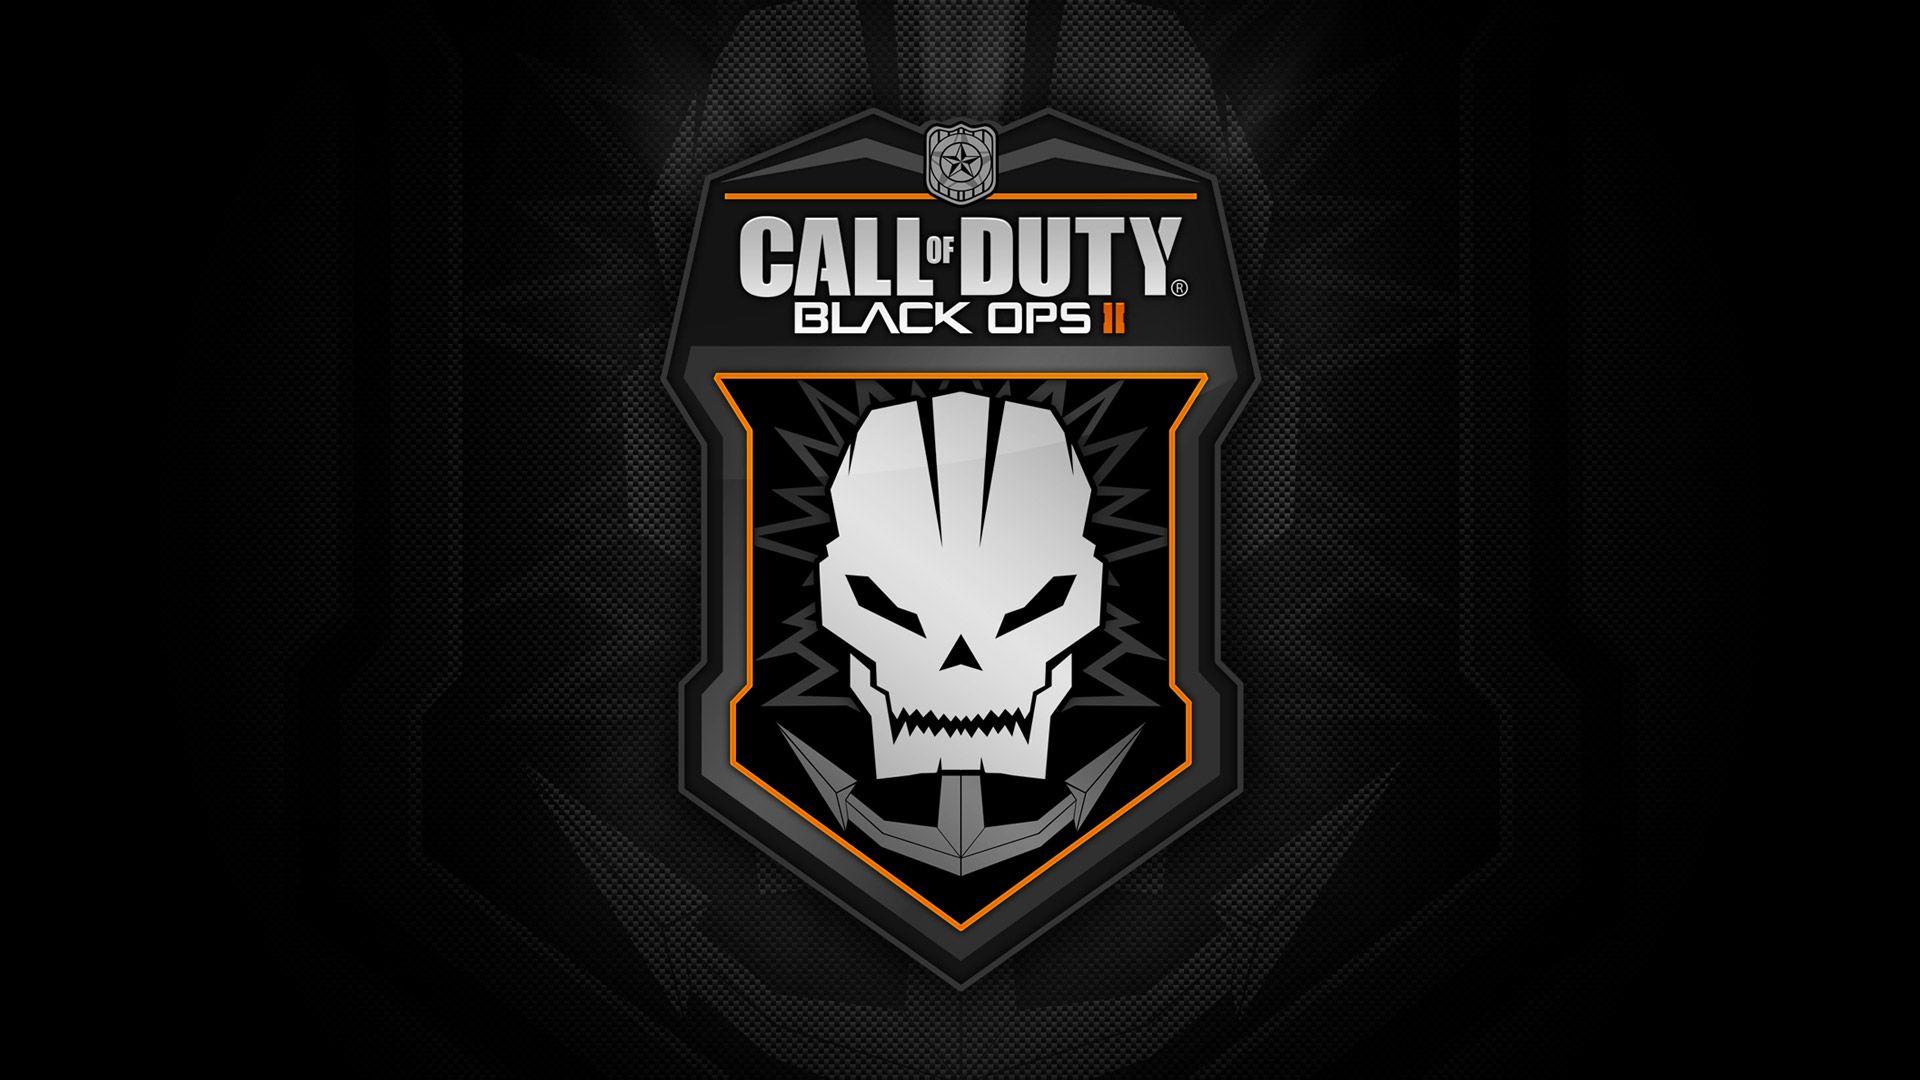 Call Of Duty Black Ops 2 Logo Wallpaper Jpg 1920 1080 Call Of Duty Call Of Duty Black Ops Iii Call Of Duty Black